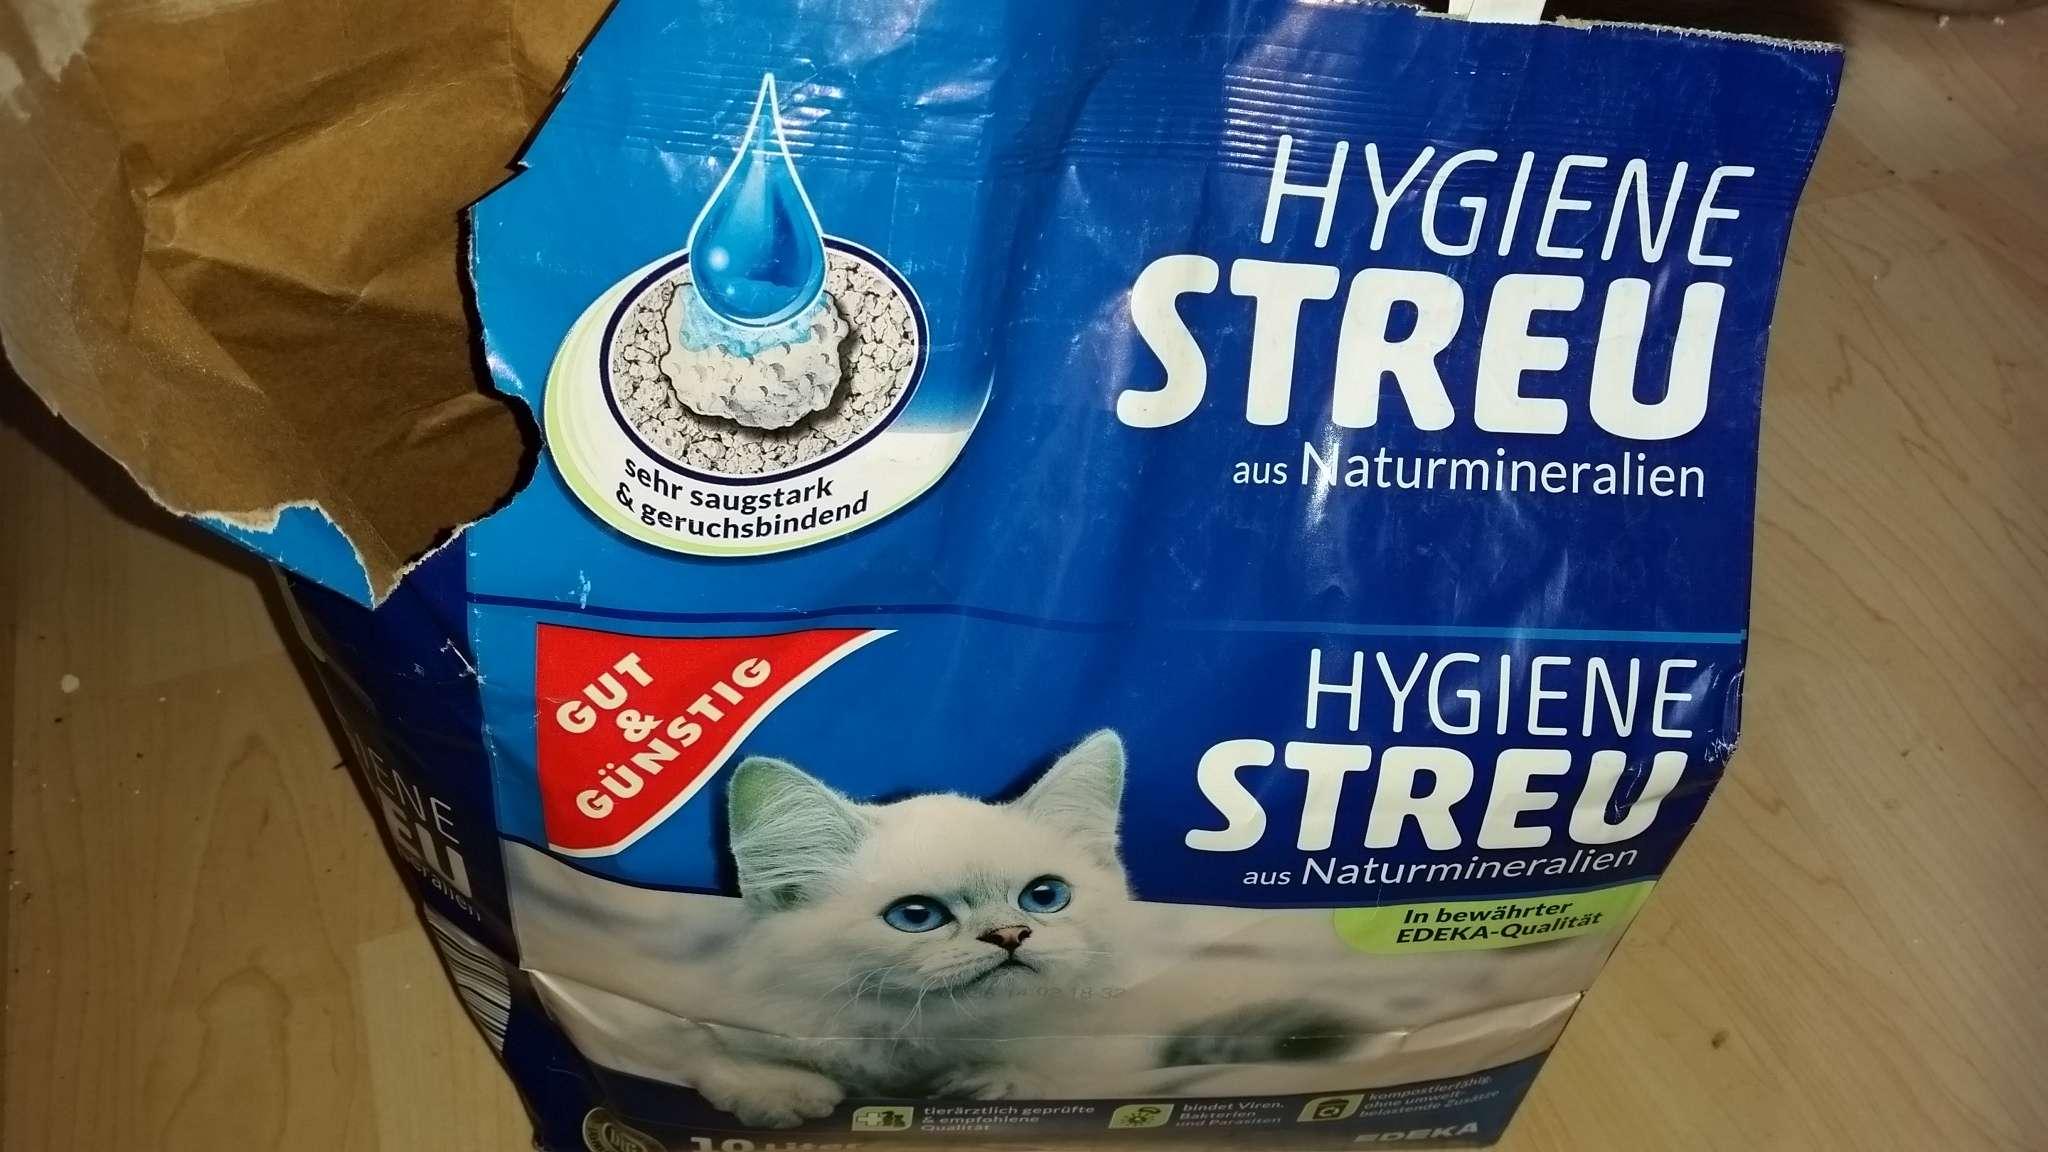 Edeka Hygiene Streu